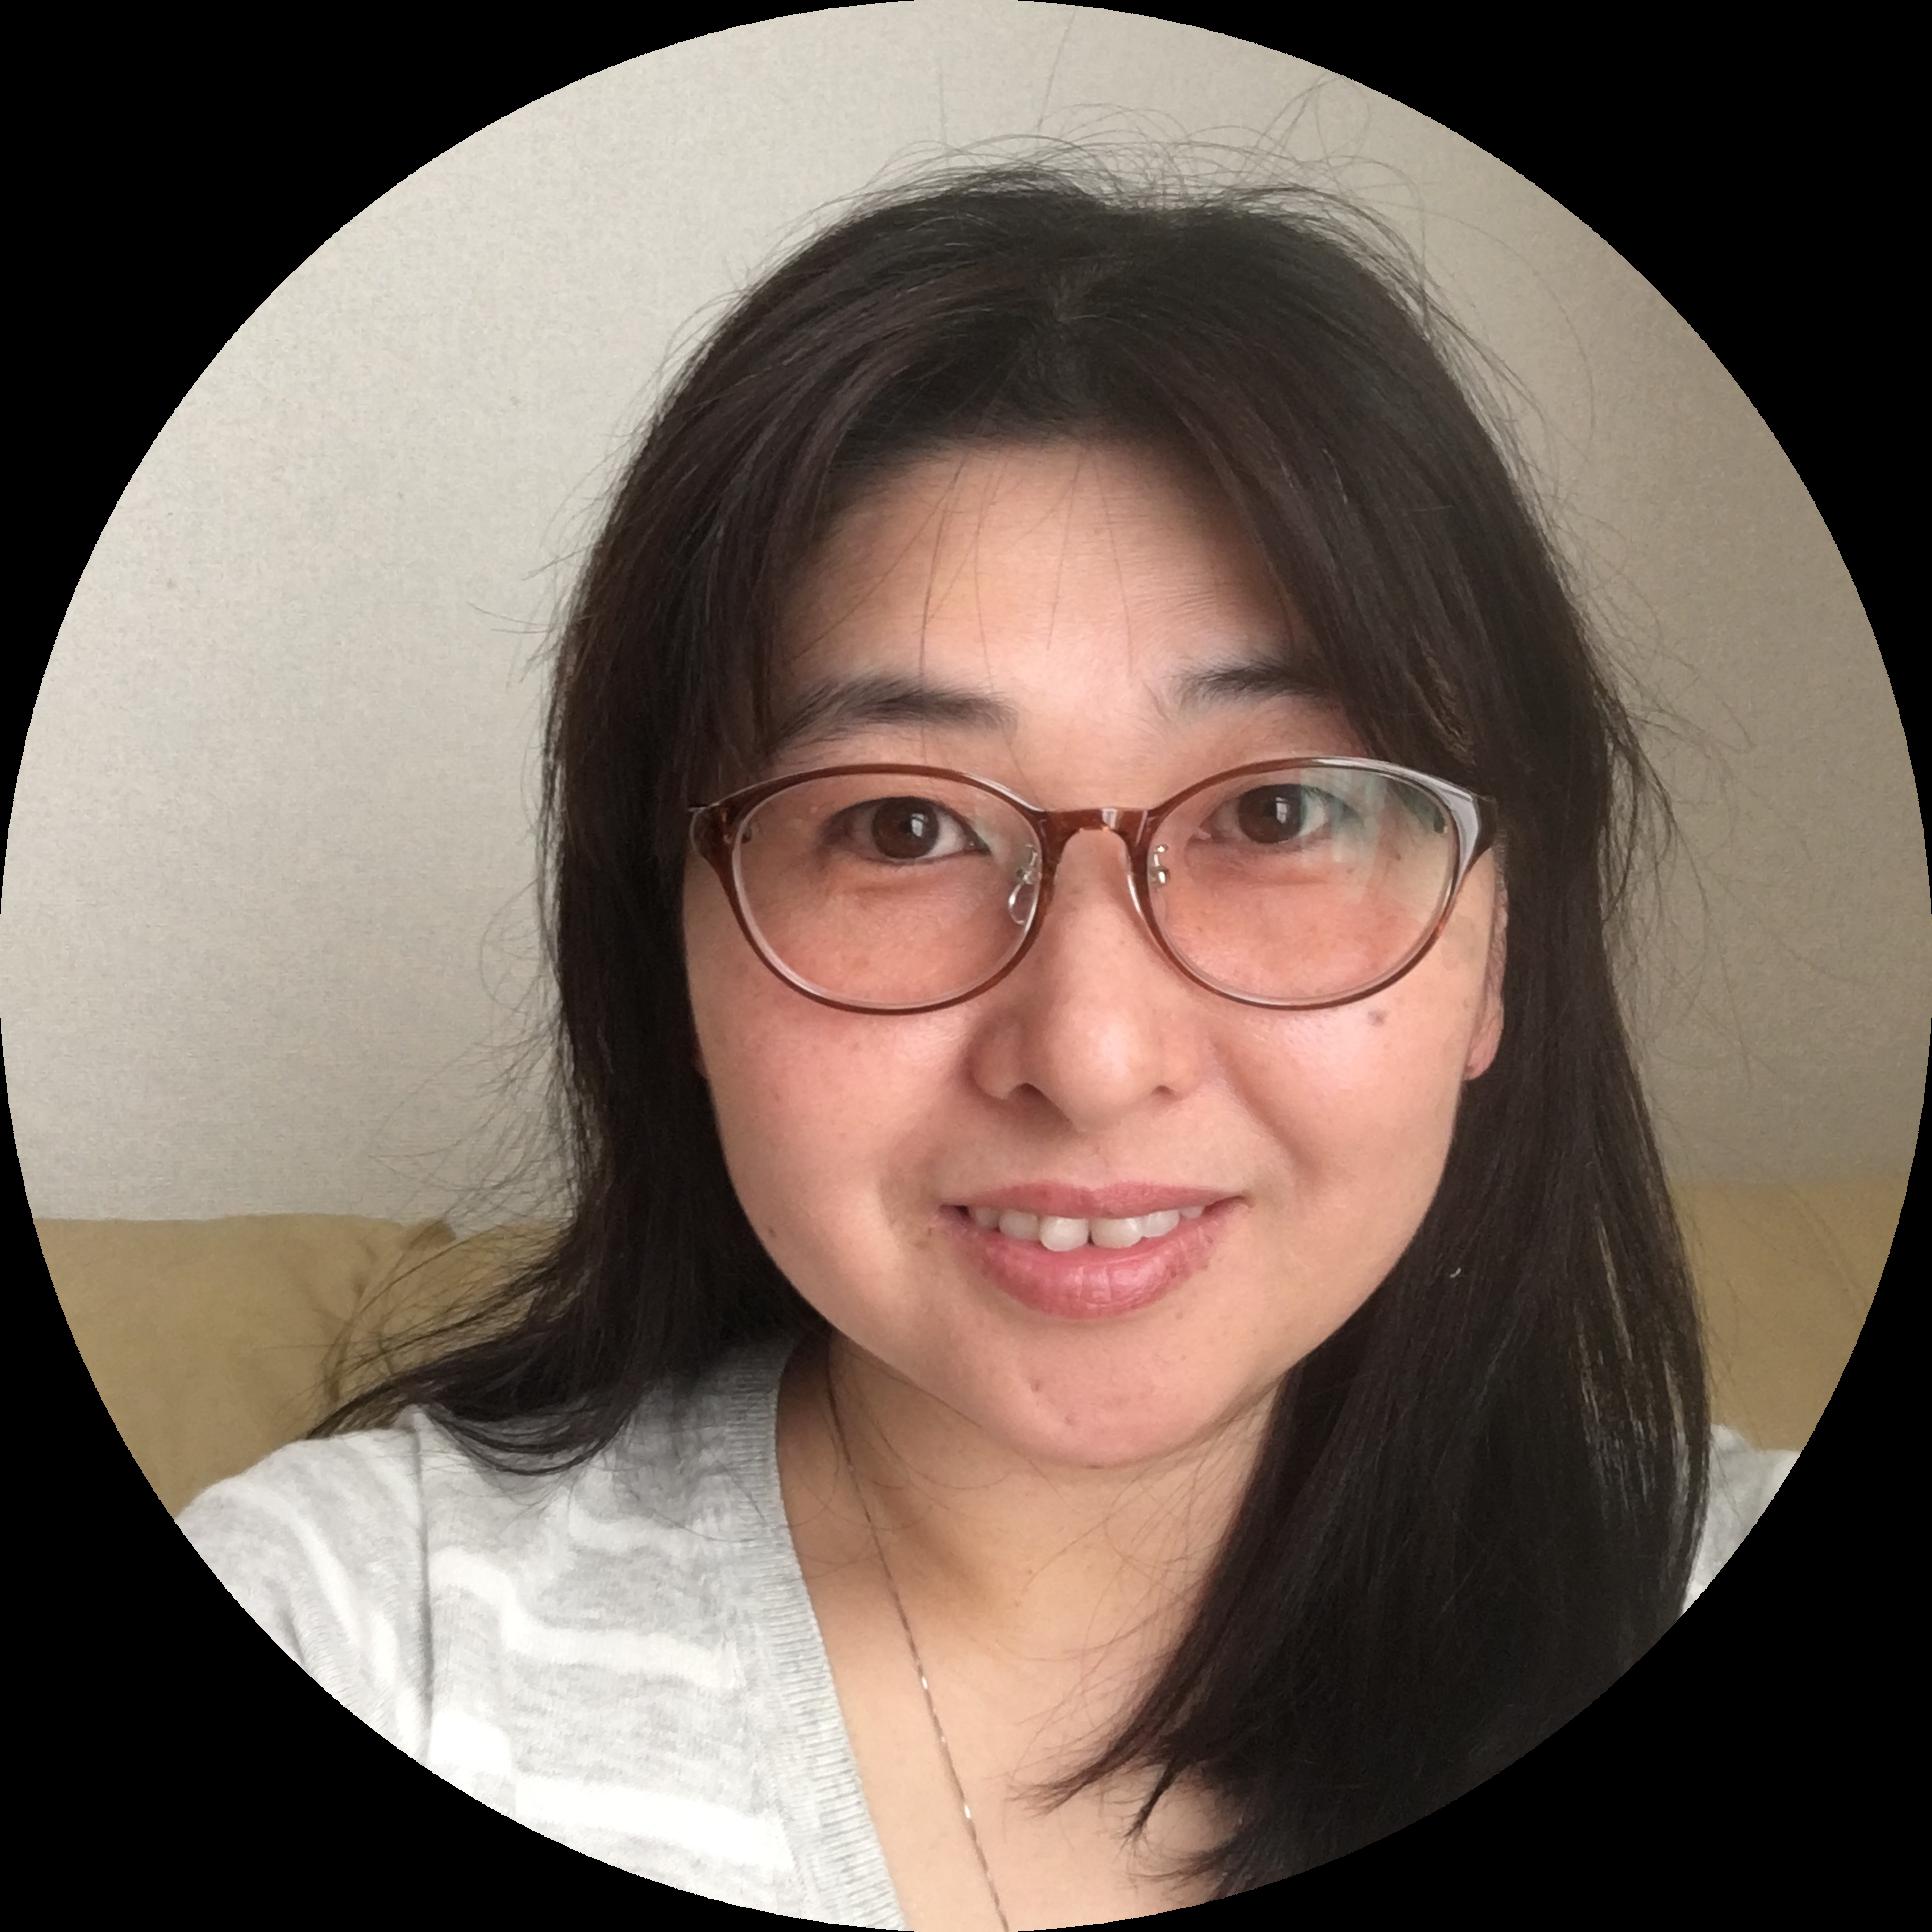 @noriko.kaneko.92 Profile Image | Linktree